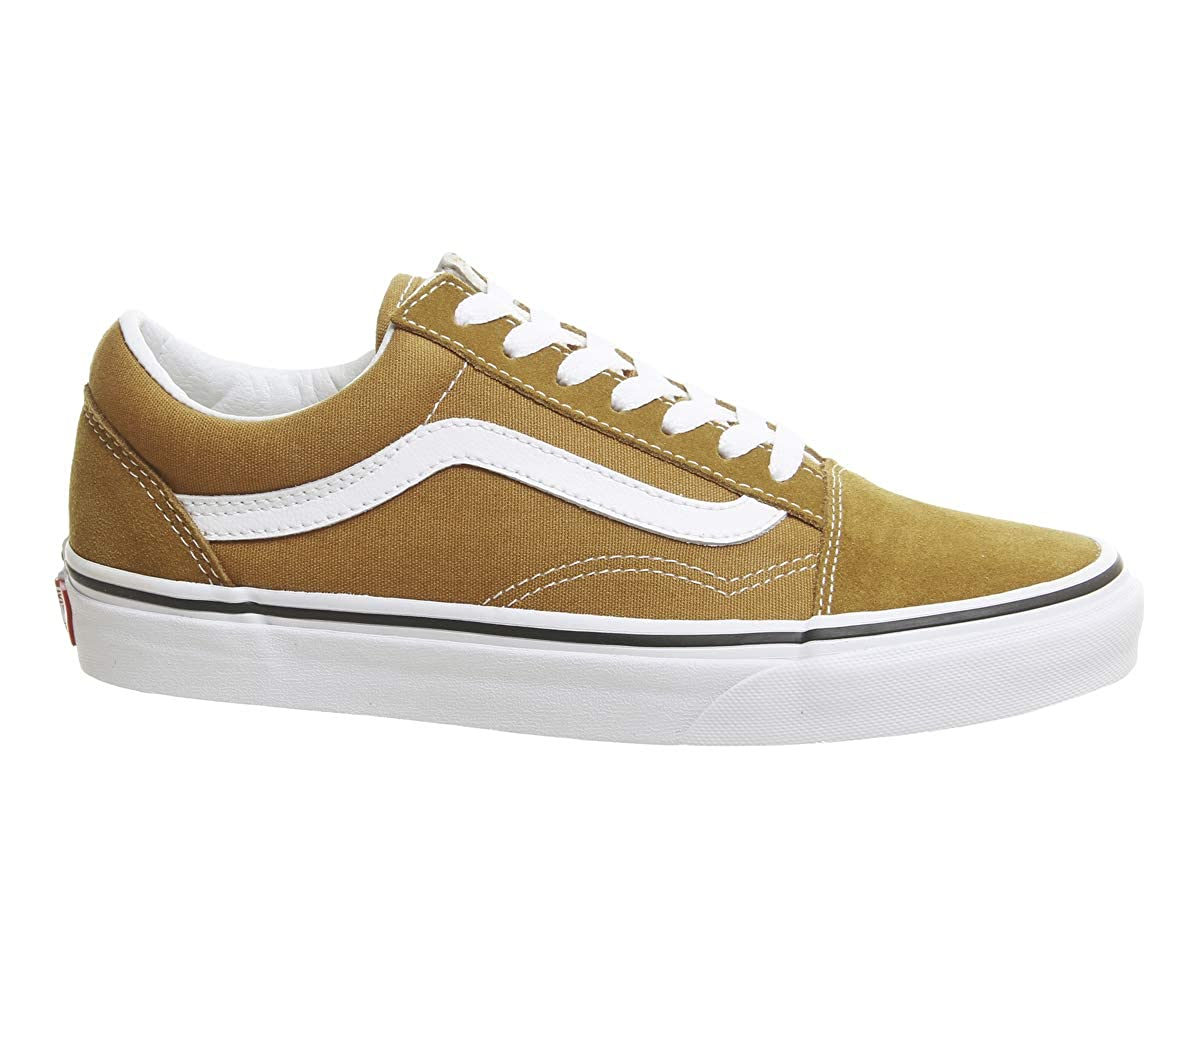 Vans Classic, Unisex Unisex Unisex - Kinder Sportschuhe - Skateboarding  00a9a8